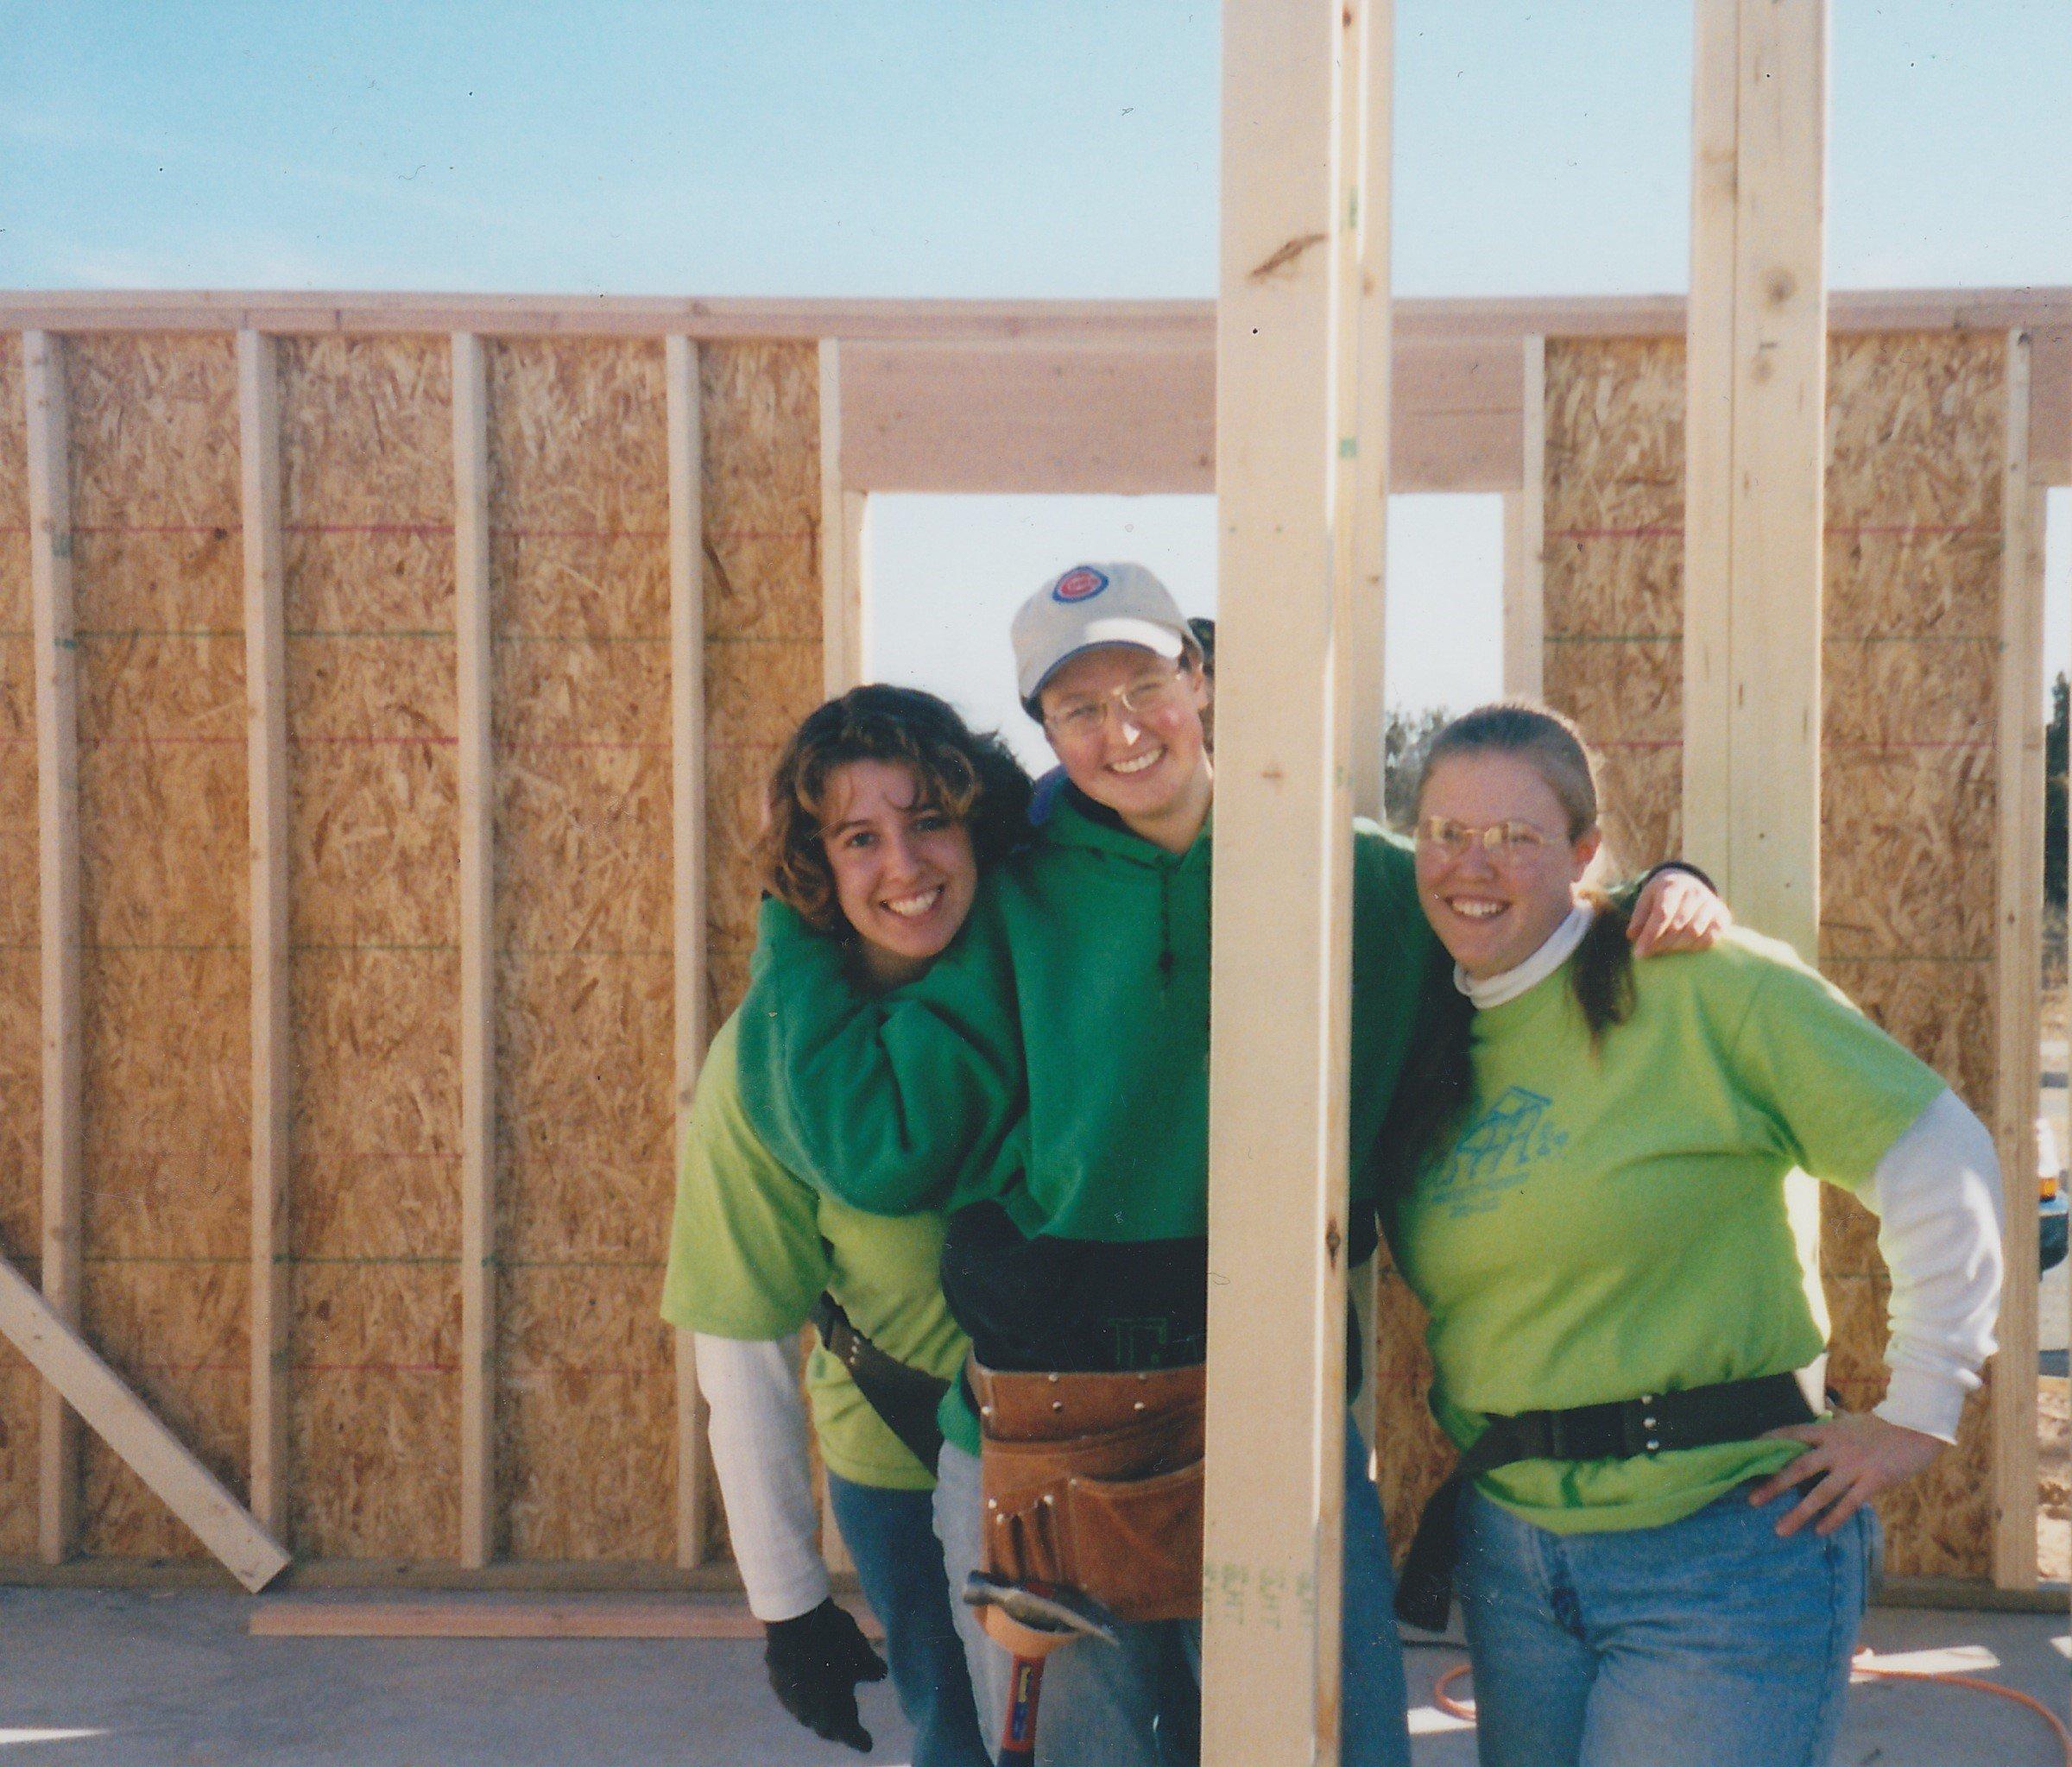 Habitat volunteer Dawn Puroway with two other women volunteers on a January 2002 homebuild in Santa Fe